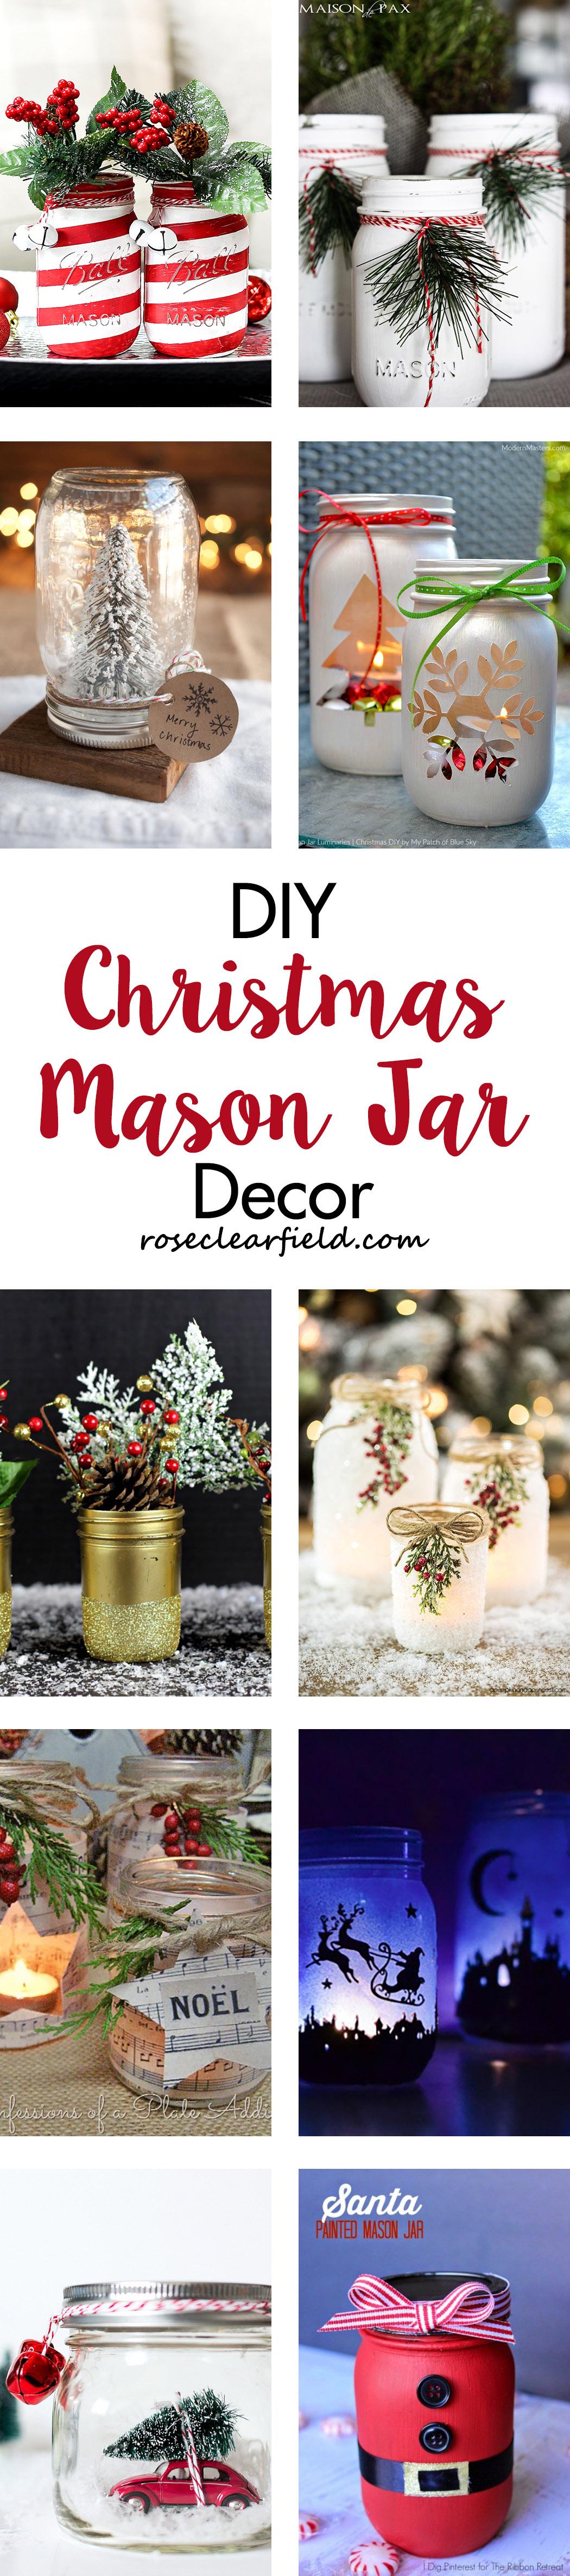 DIY Christmas Mason Jar Decor | https://www.roseclearfield.com